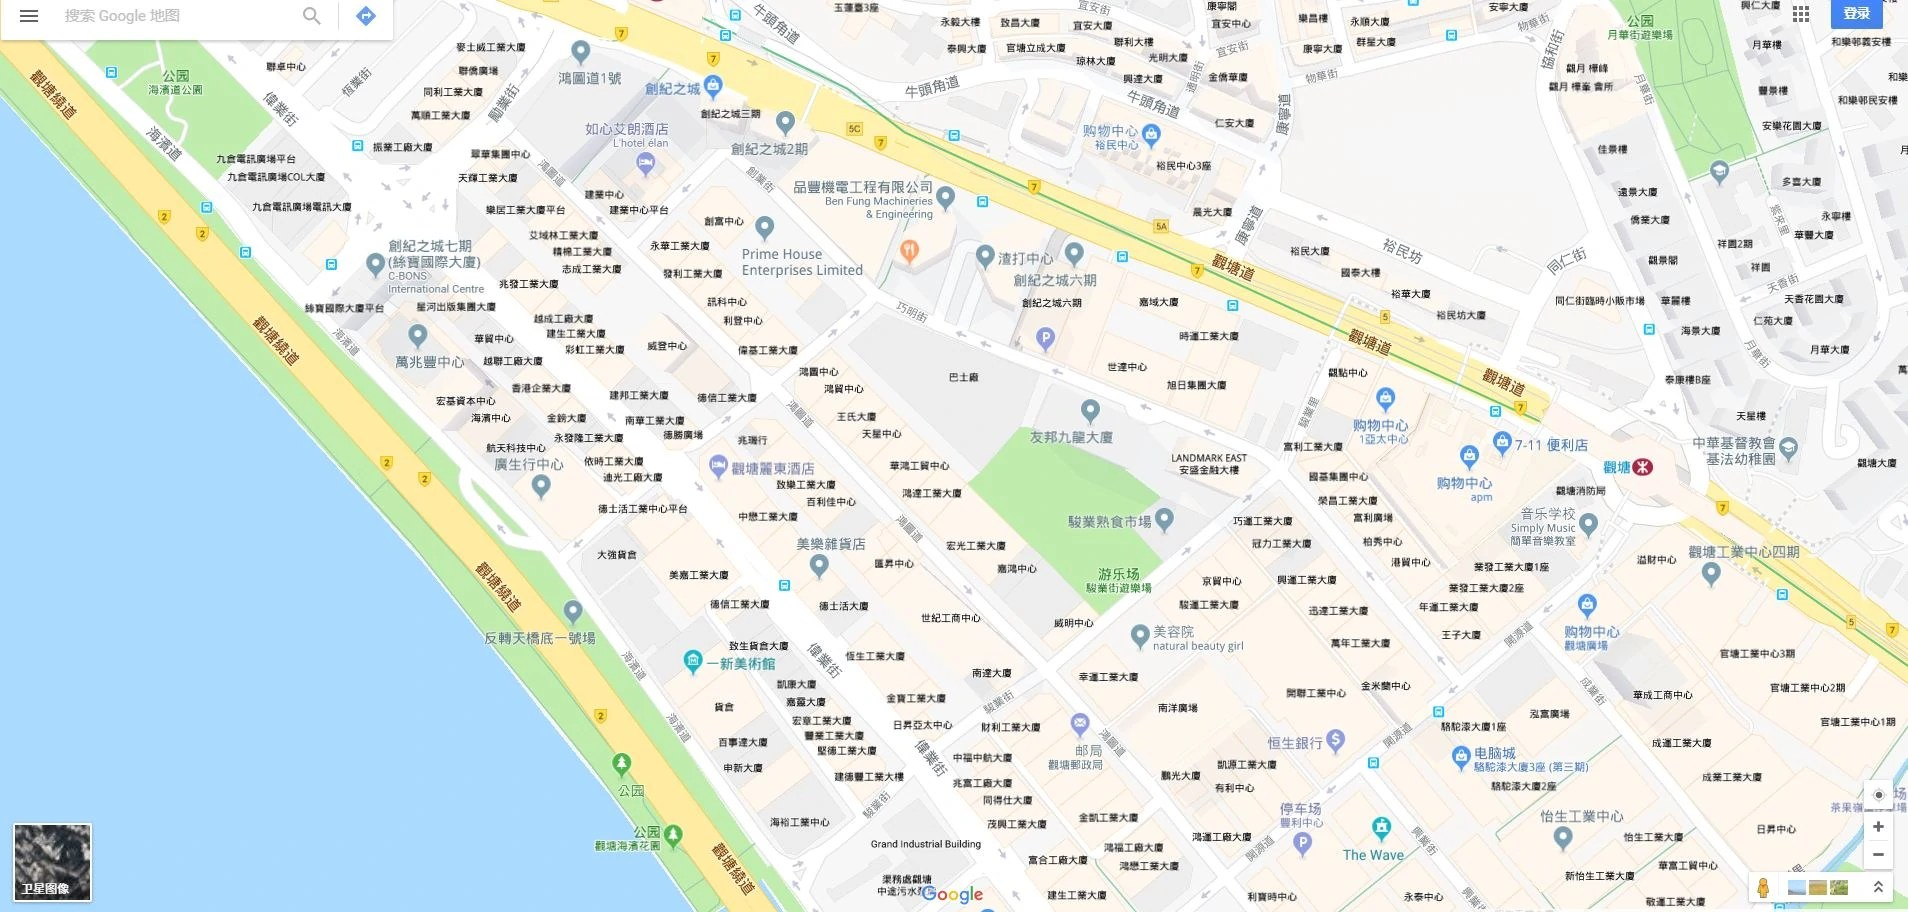 Google地圖 | 香港網絡大典 | FANDOM powered by Wikia